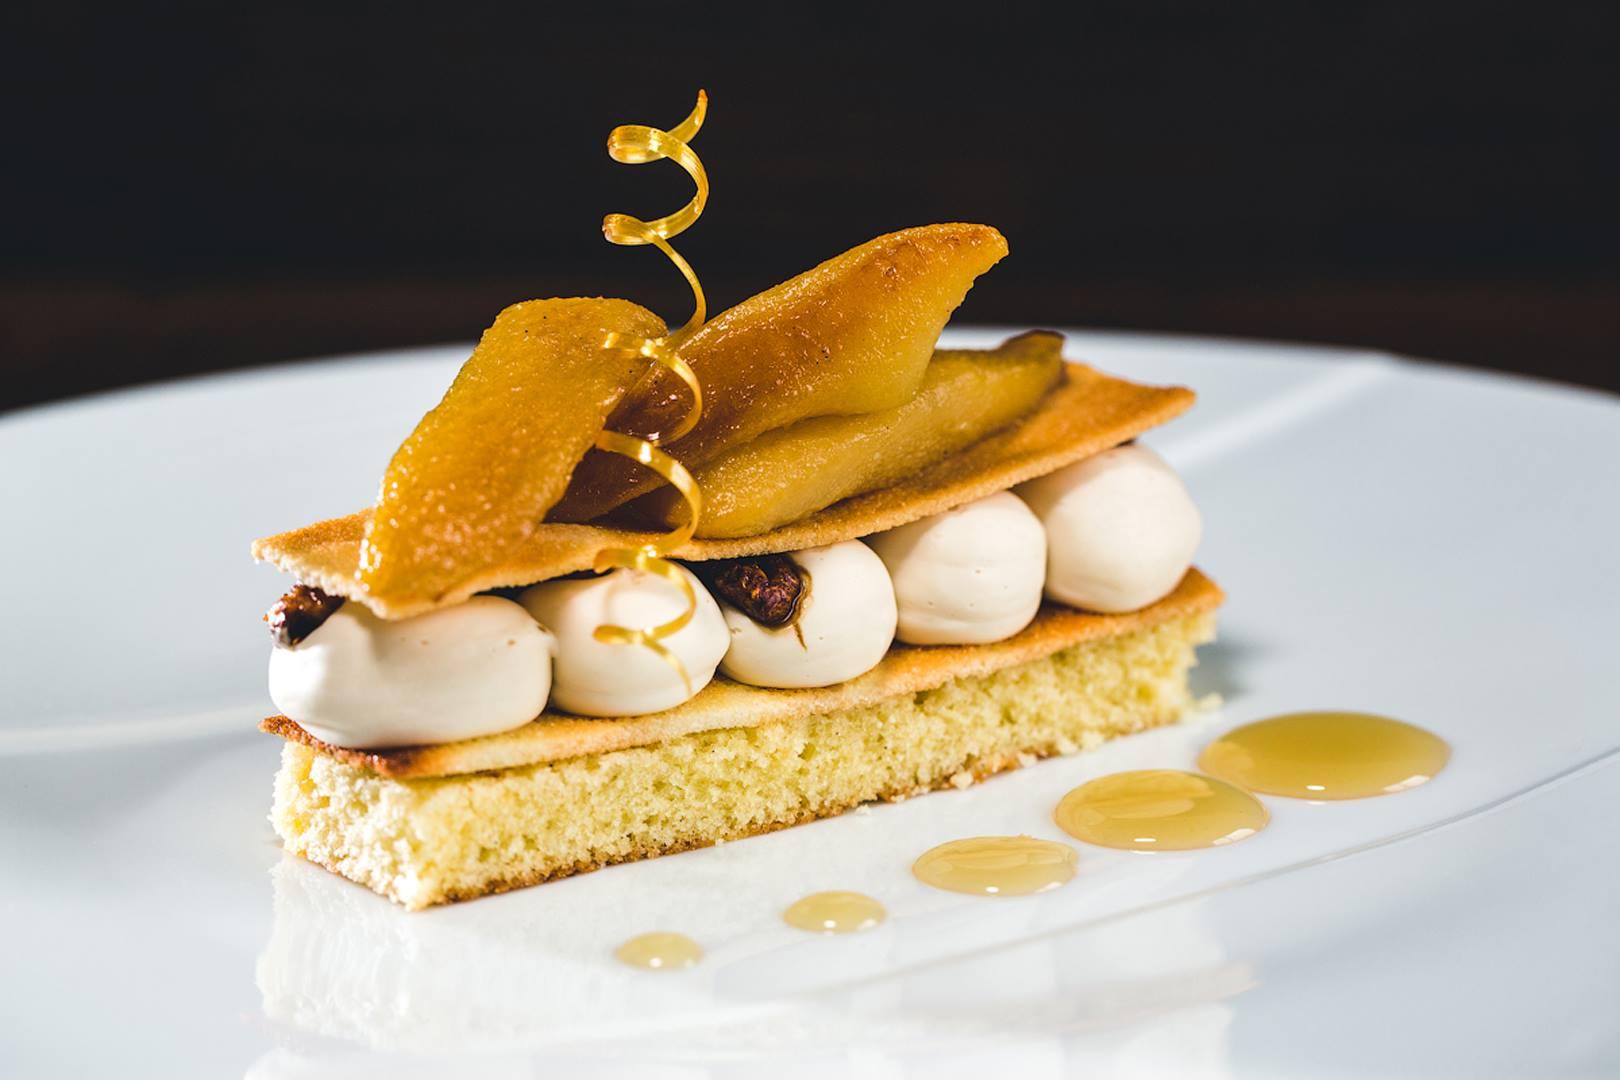 Bien connu Carte et menus - Restaurant Le Pelican KF86